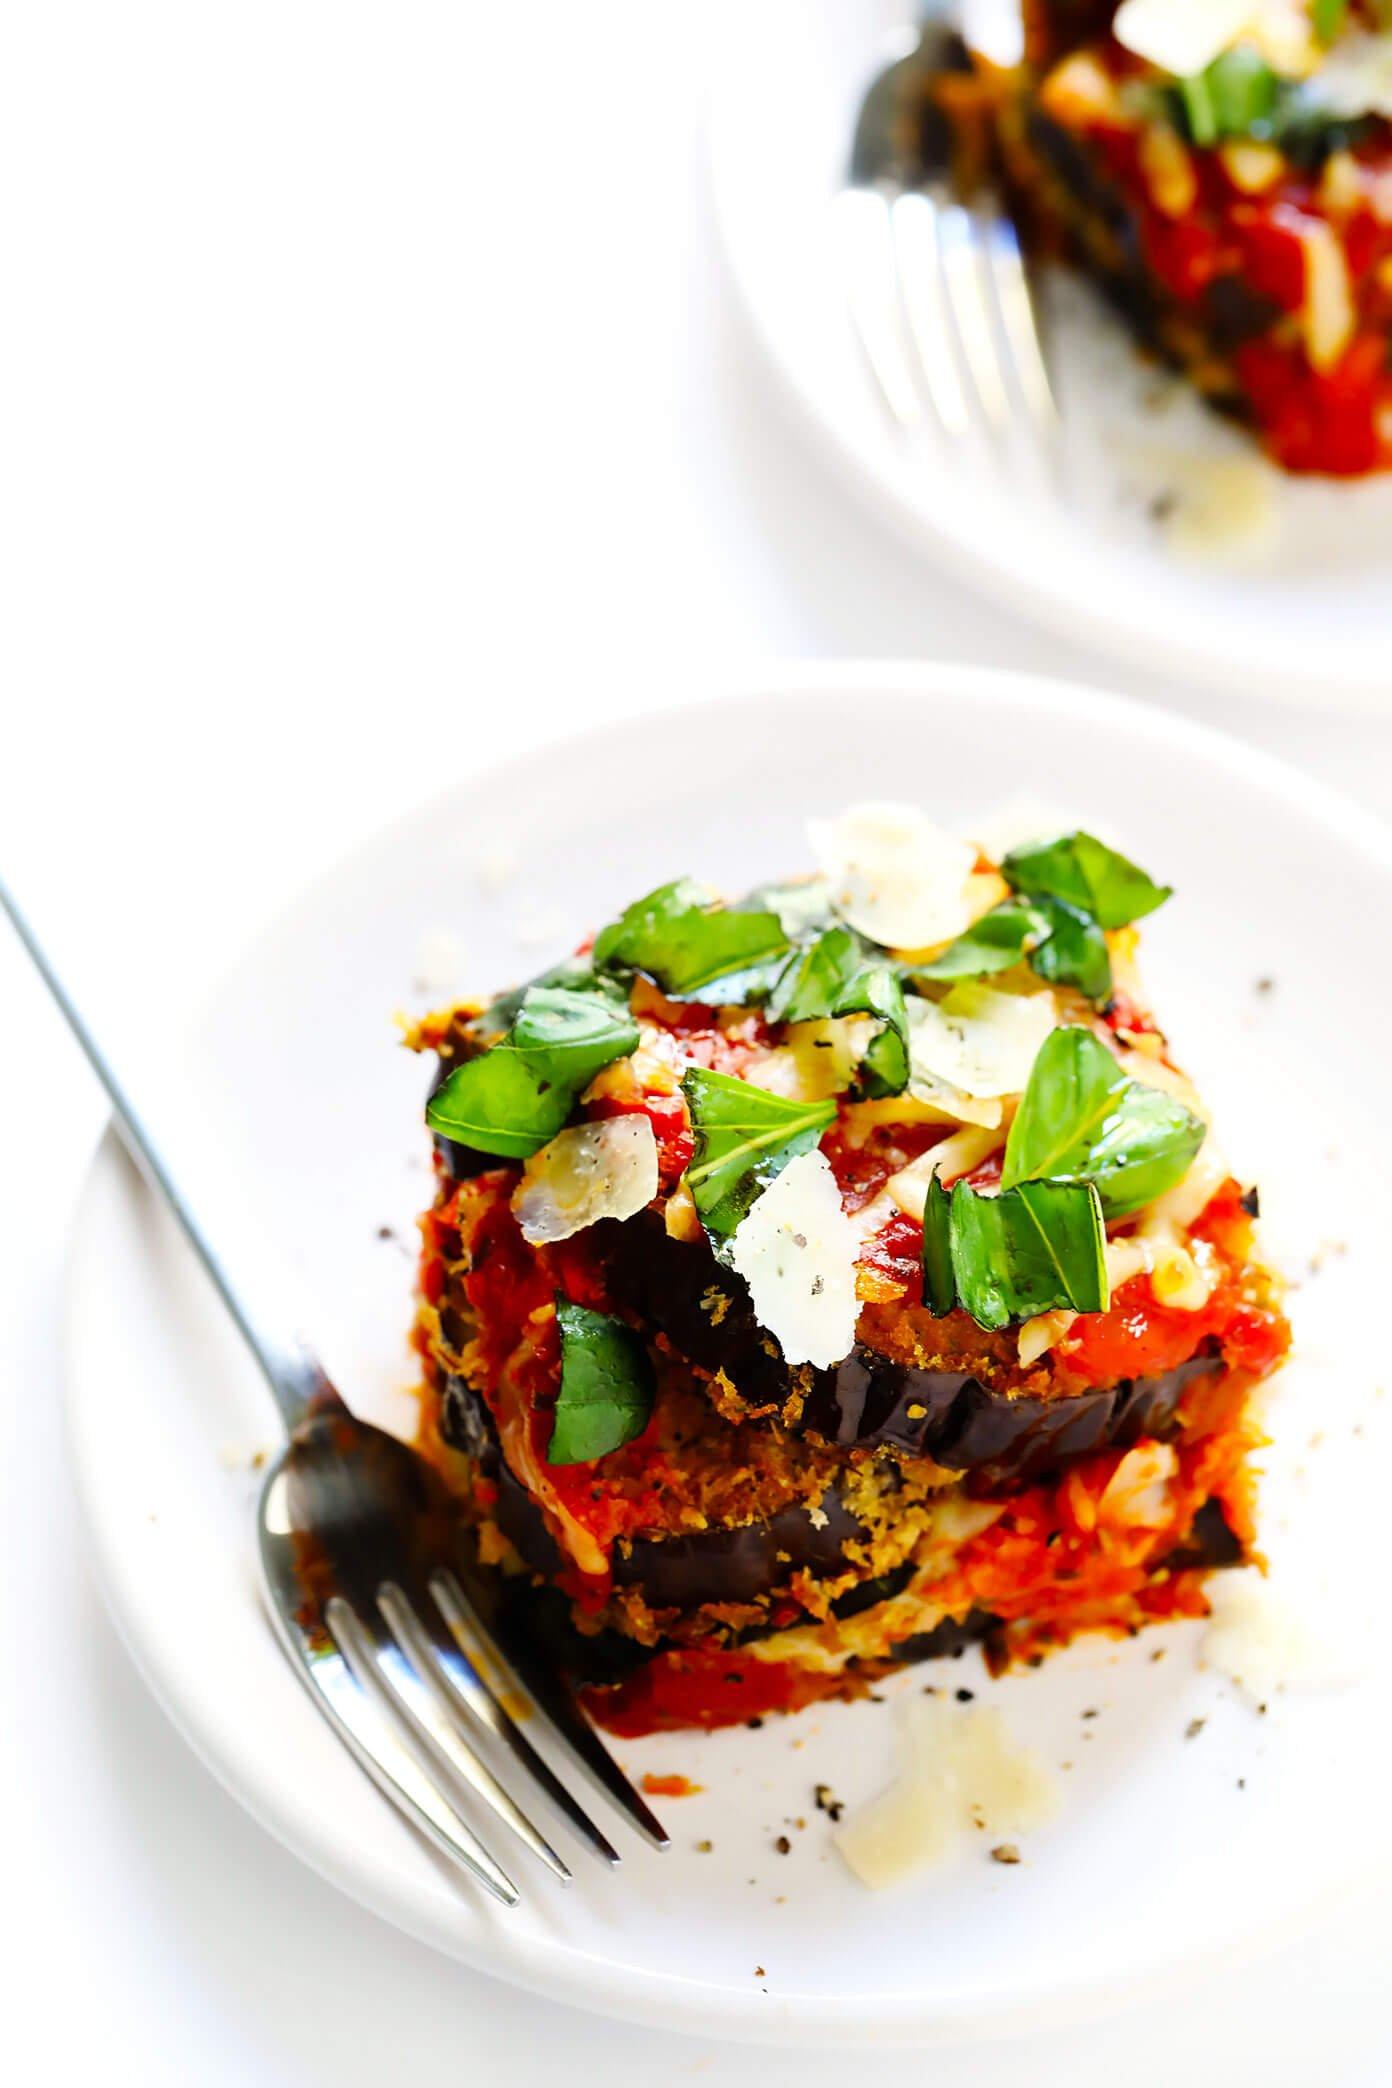 Eggplant Parmesan with Basil